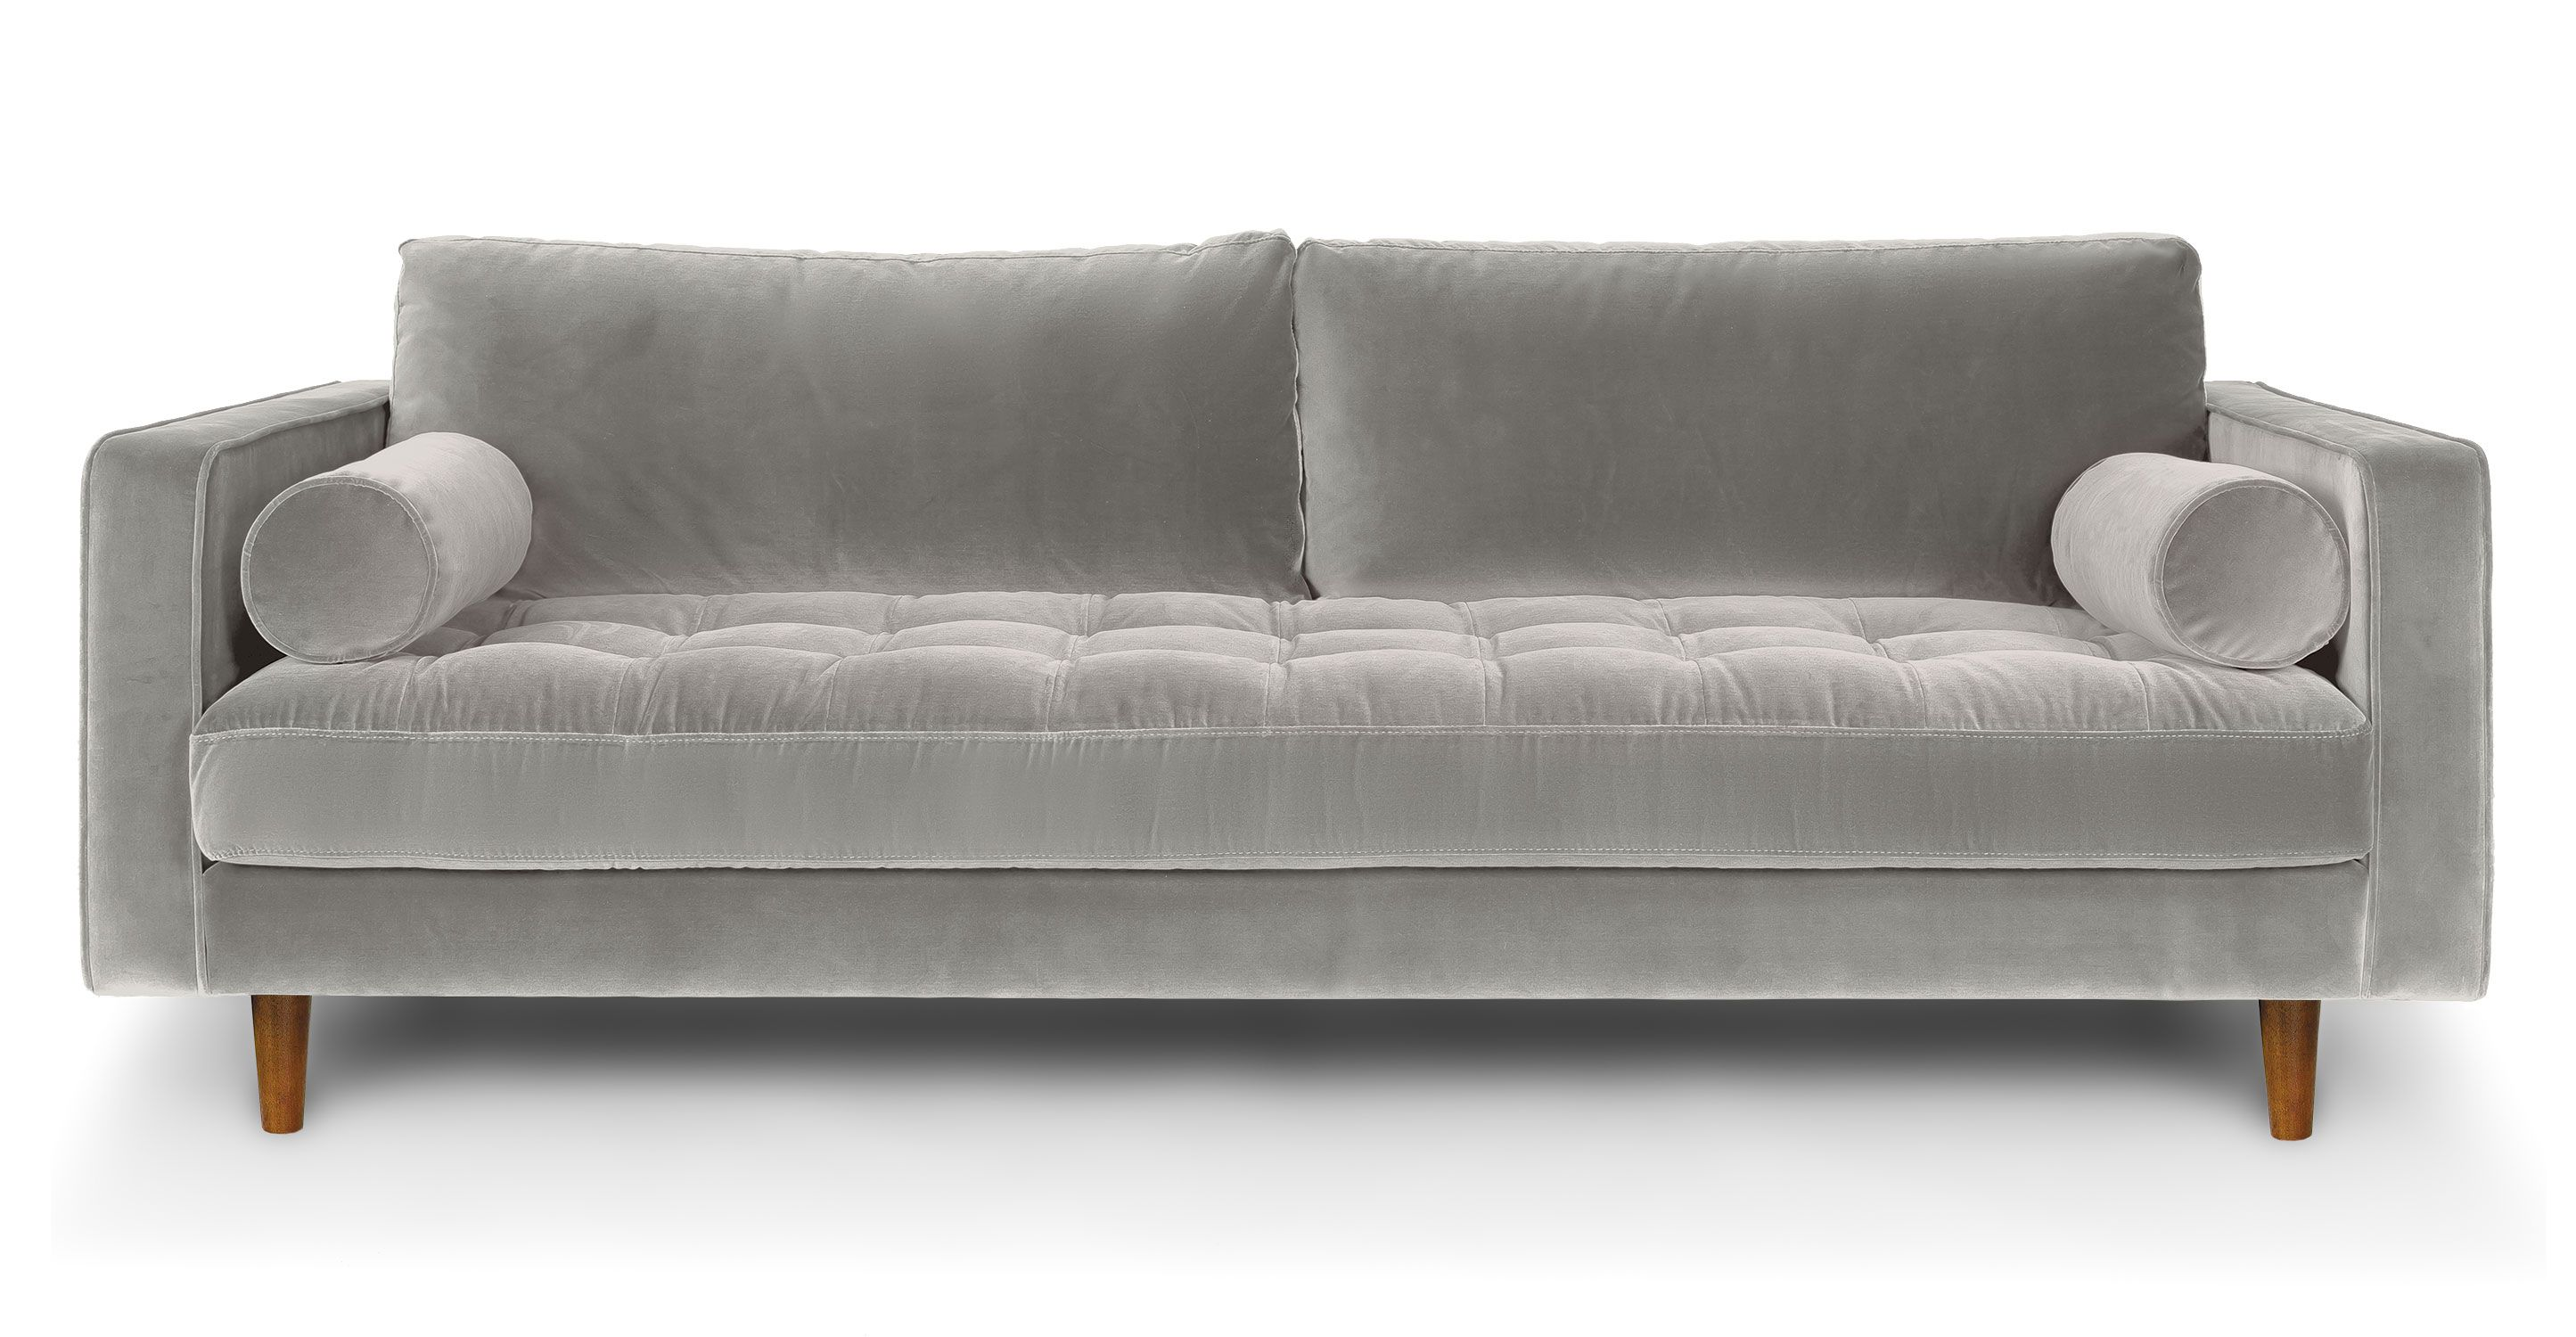 Sven Intuition Grey Sofa Gray Sofa Mid Century Modern Sofa Sofa